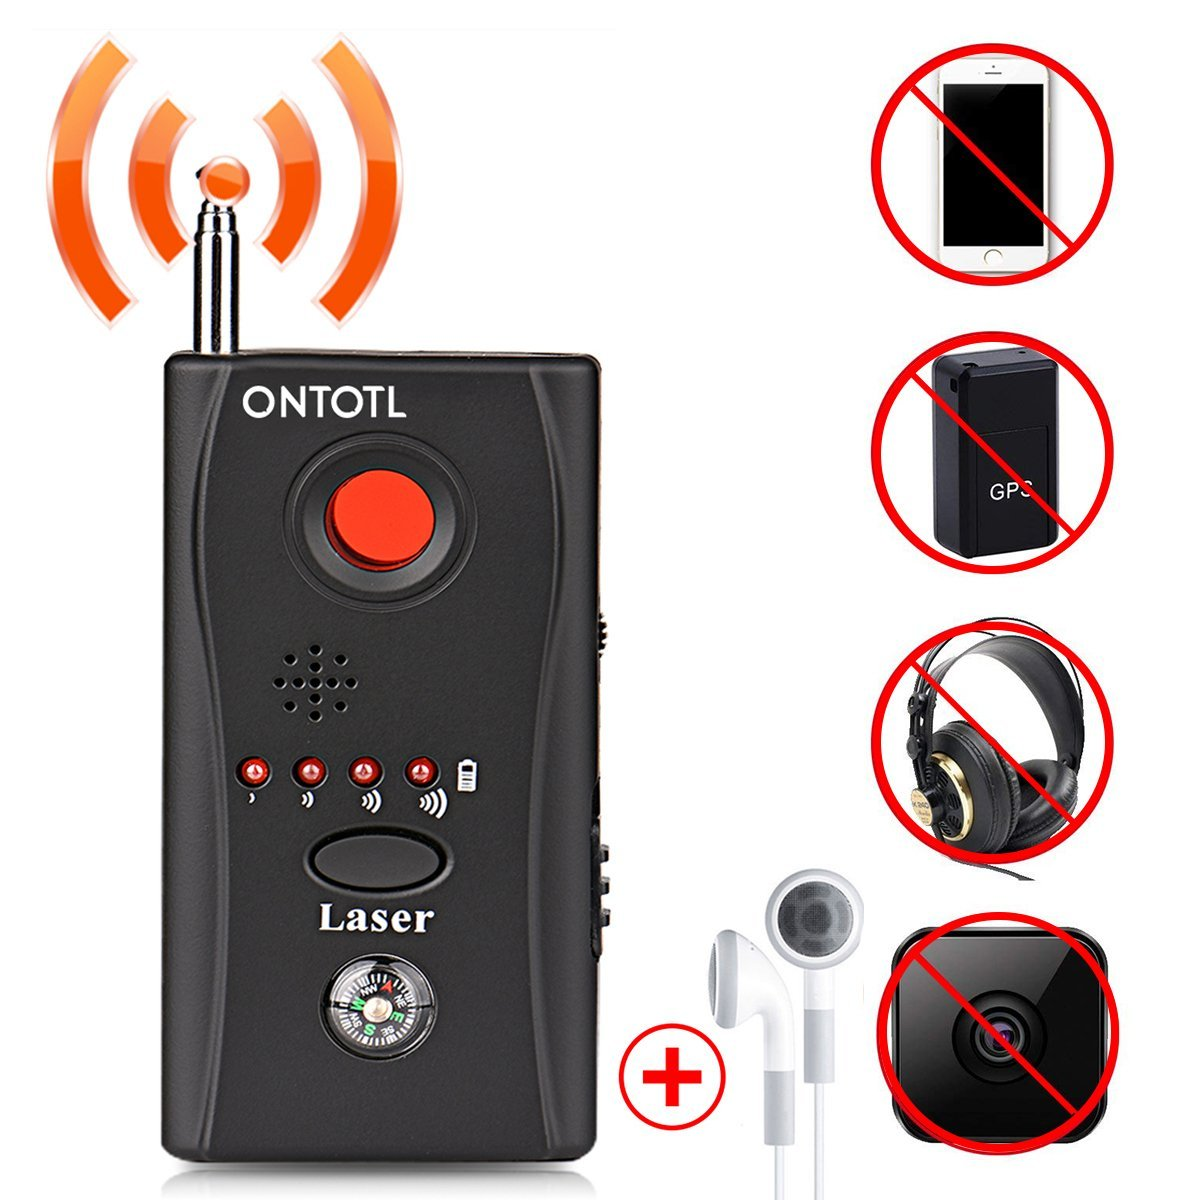 Anti-spy Camera Bug RF Detector,ONTOTL Wireless Bug Detector Hidden Camera Lens Detector Radio Wave Signal Detect Full-range GSM Device Finder,Camera Detector for Anti Eavesdropping/Candid/GPS Tracker